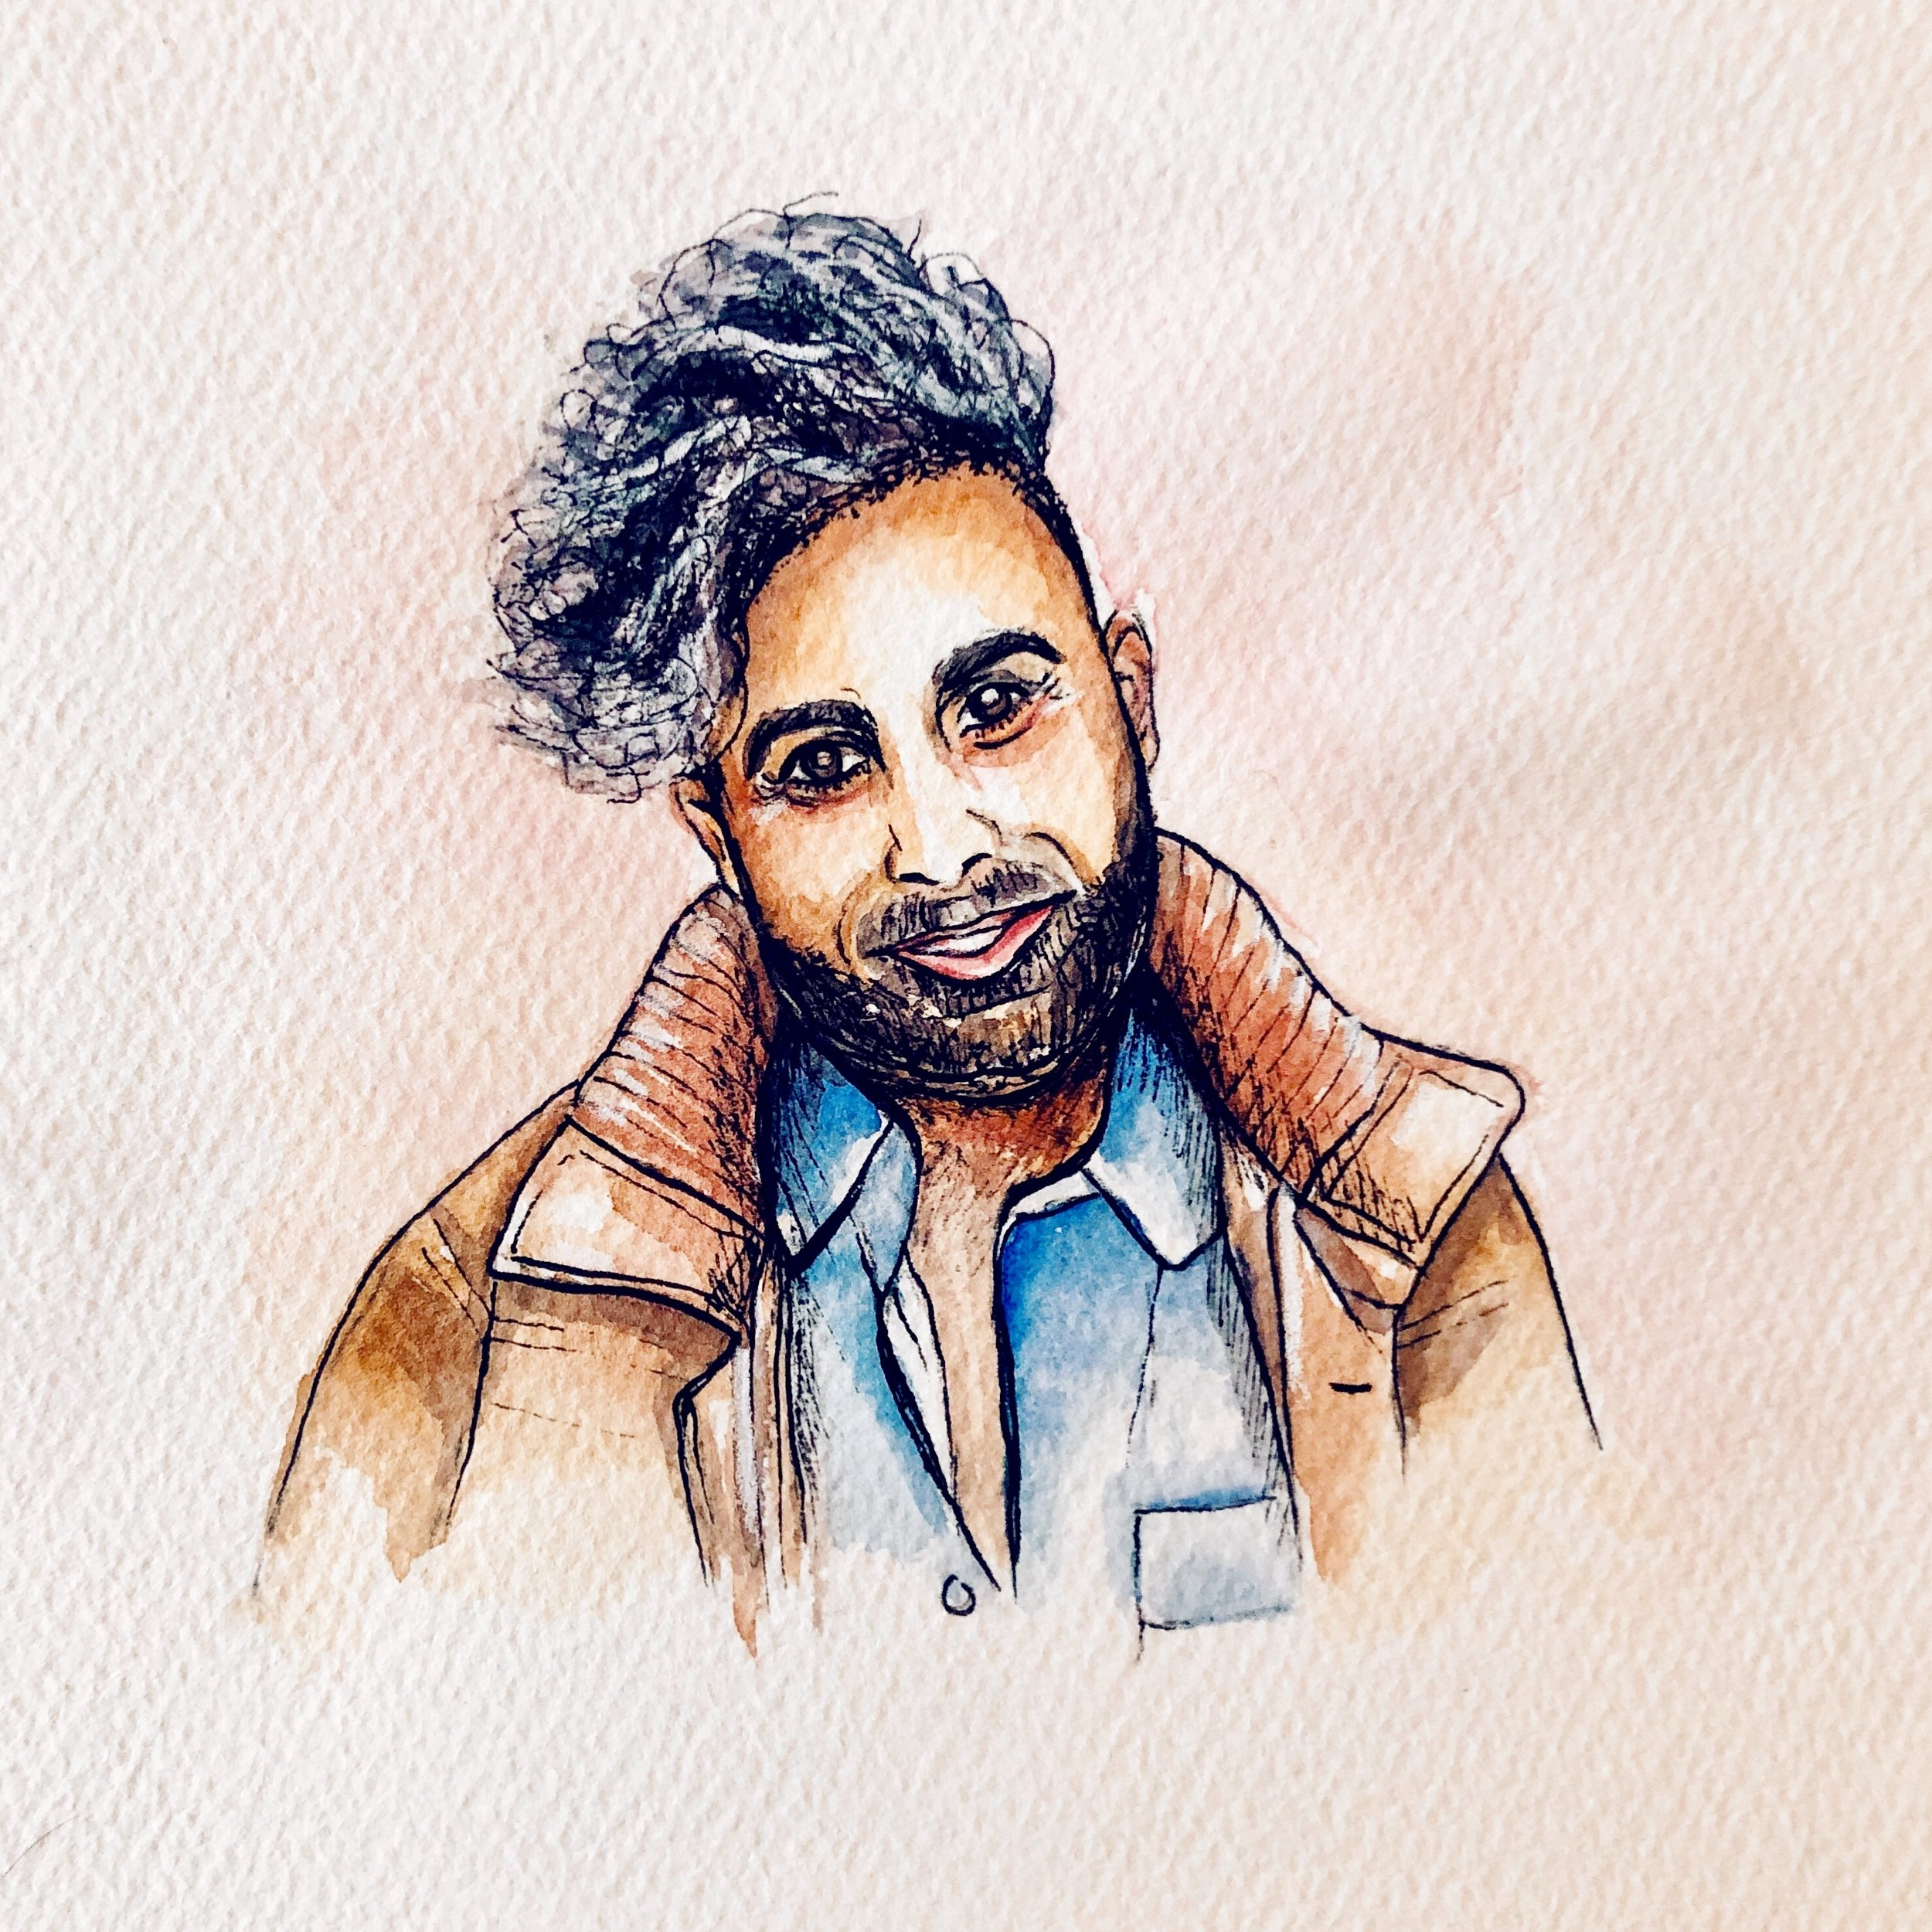 Episode Art by Rage Kidvai    @rkidvai